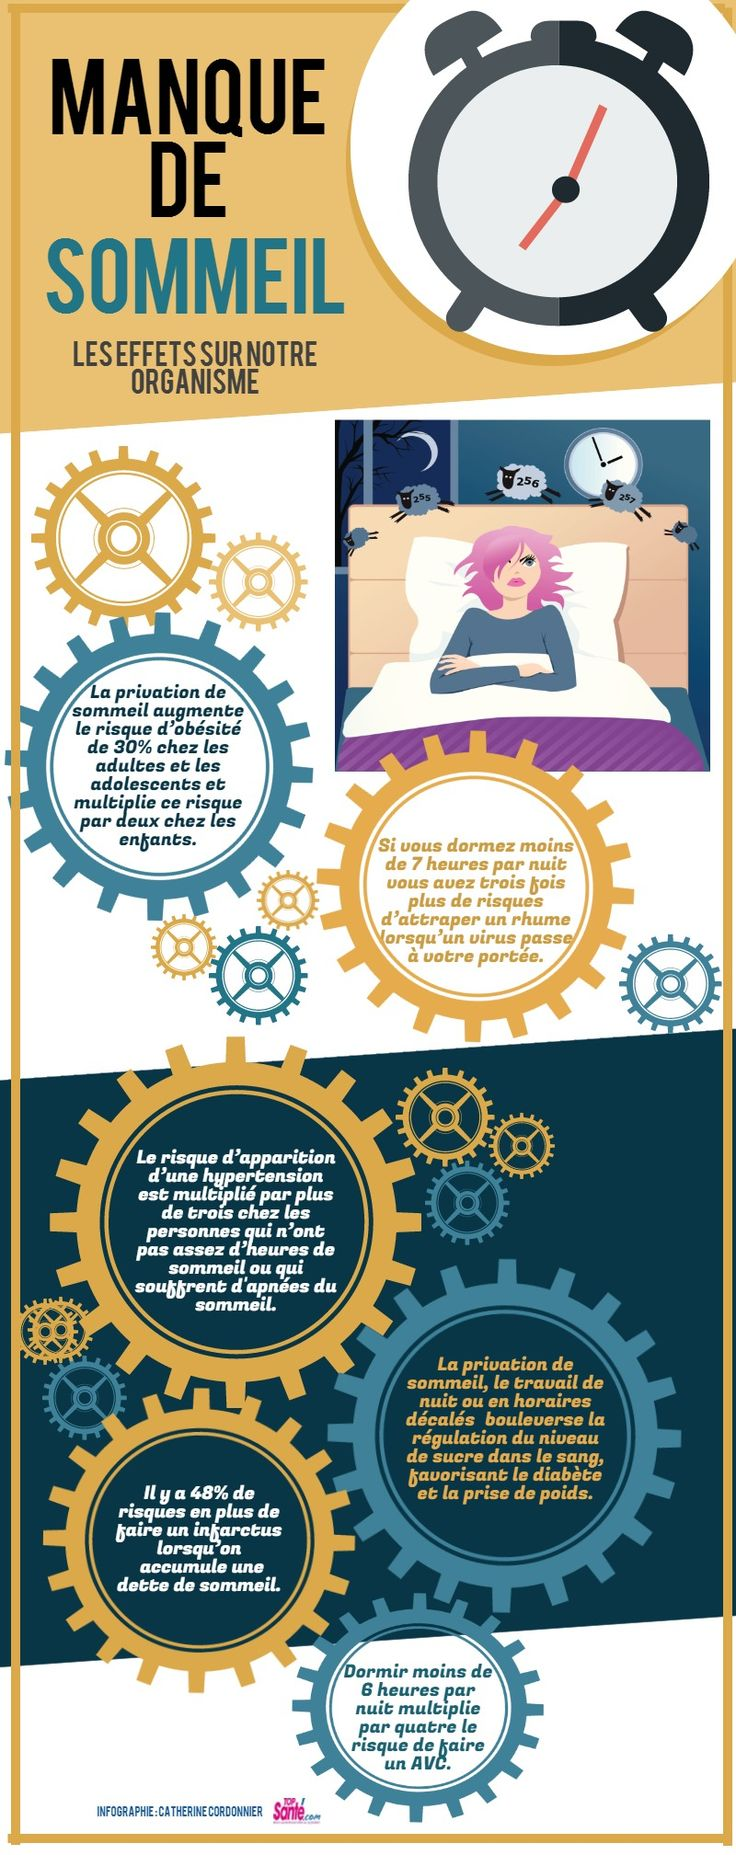 Dette de sommeil | Piktochart Infographic Editor